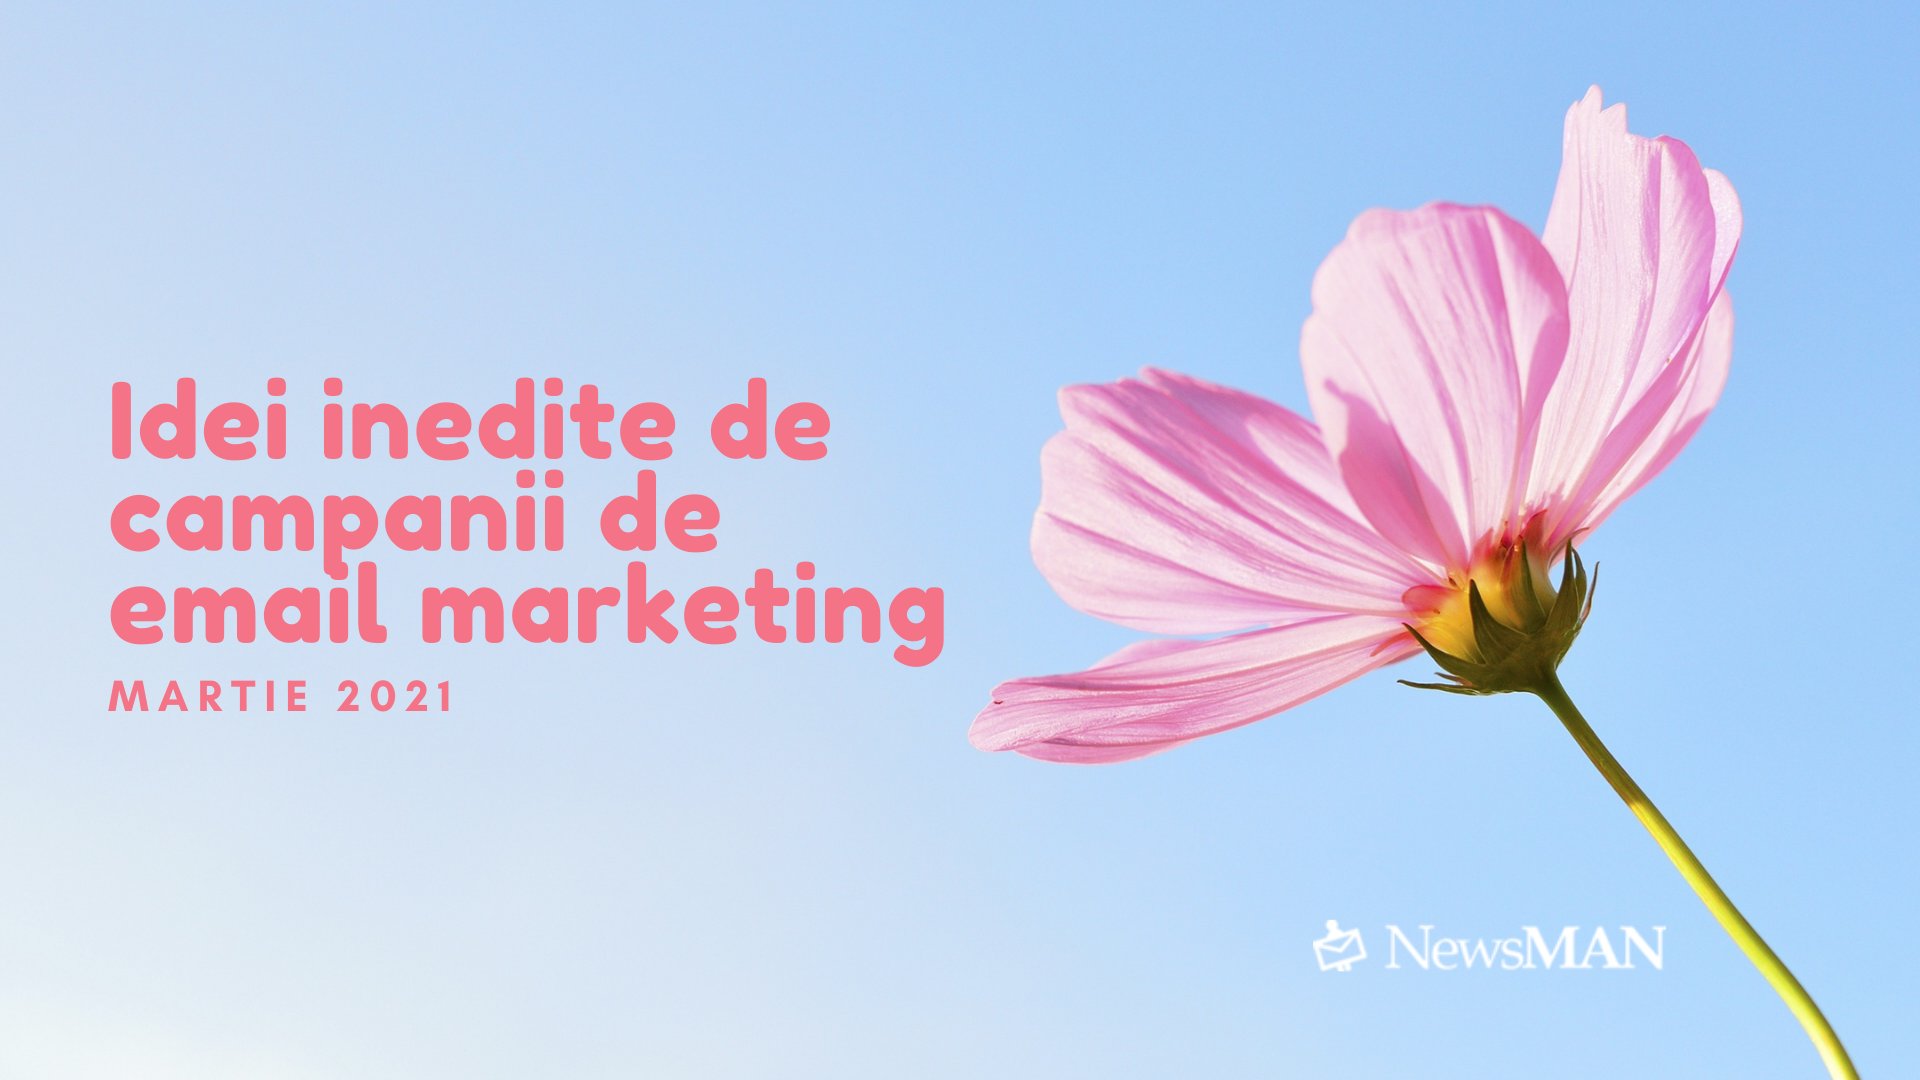 In martie, iesi din rutina: idei inedite de campanii de email marketing